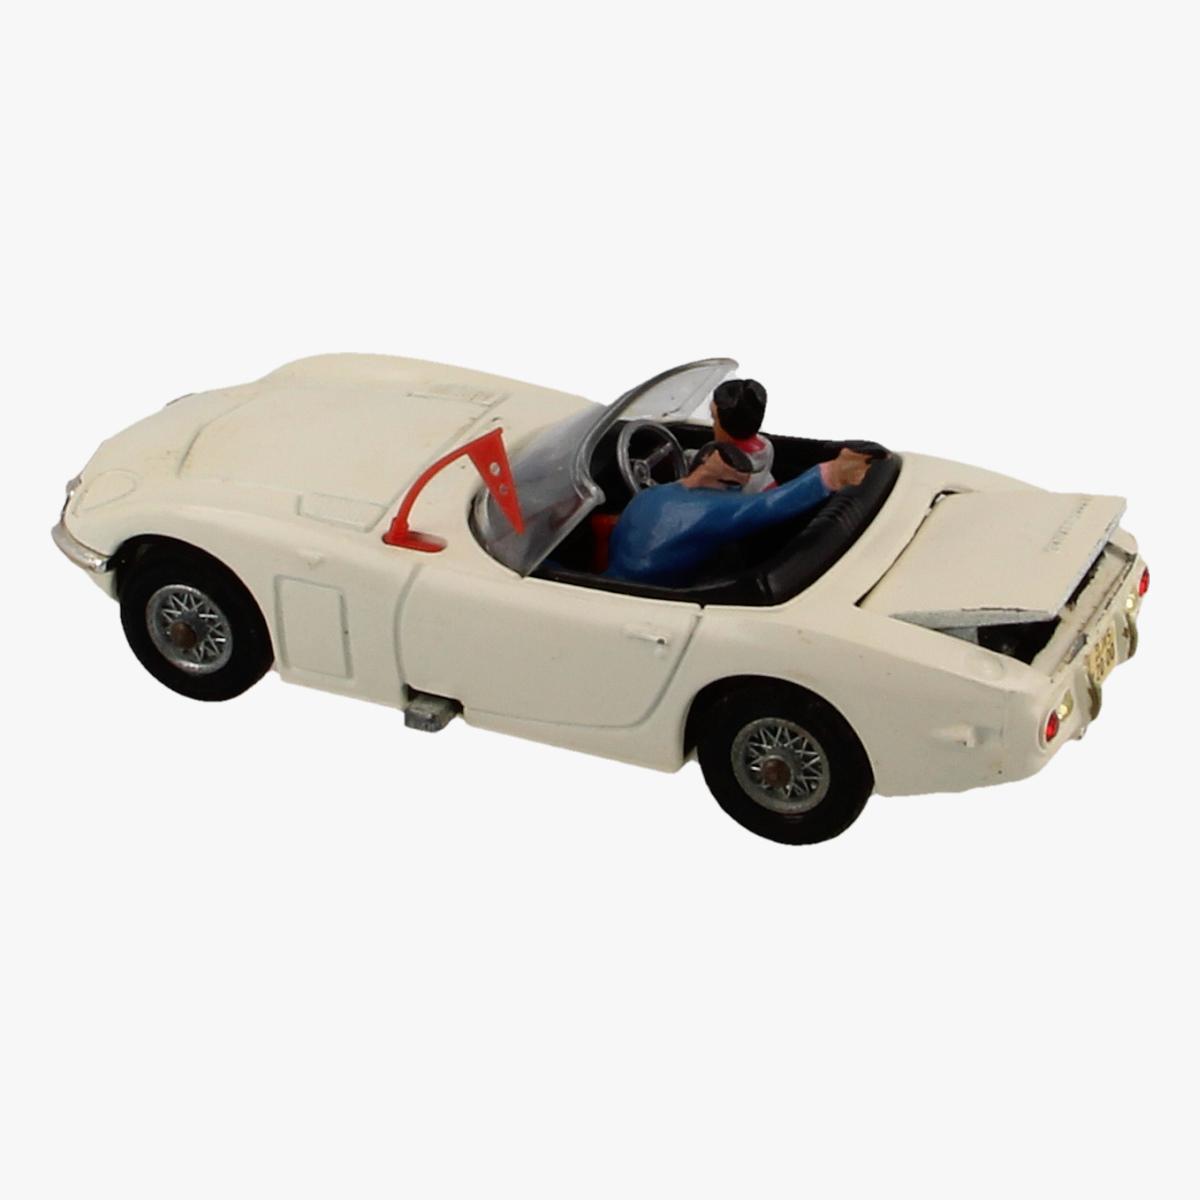 "Afbeeldingen van Corgi Toys. James Bond Toyota 2000 GT. From the film "" You only live Twice""  Nr. 336"